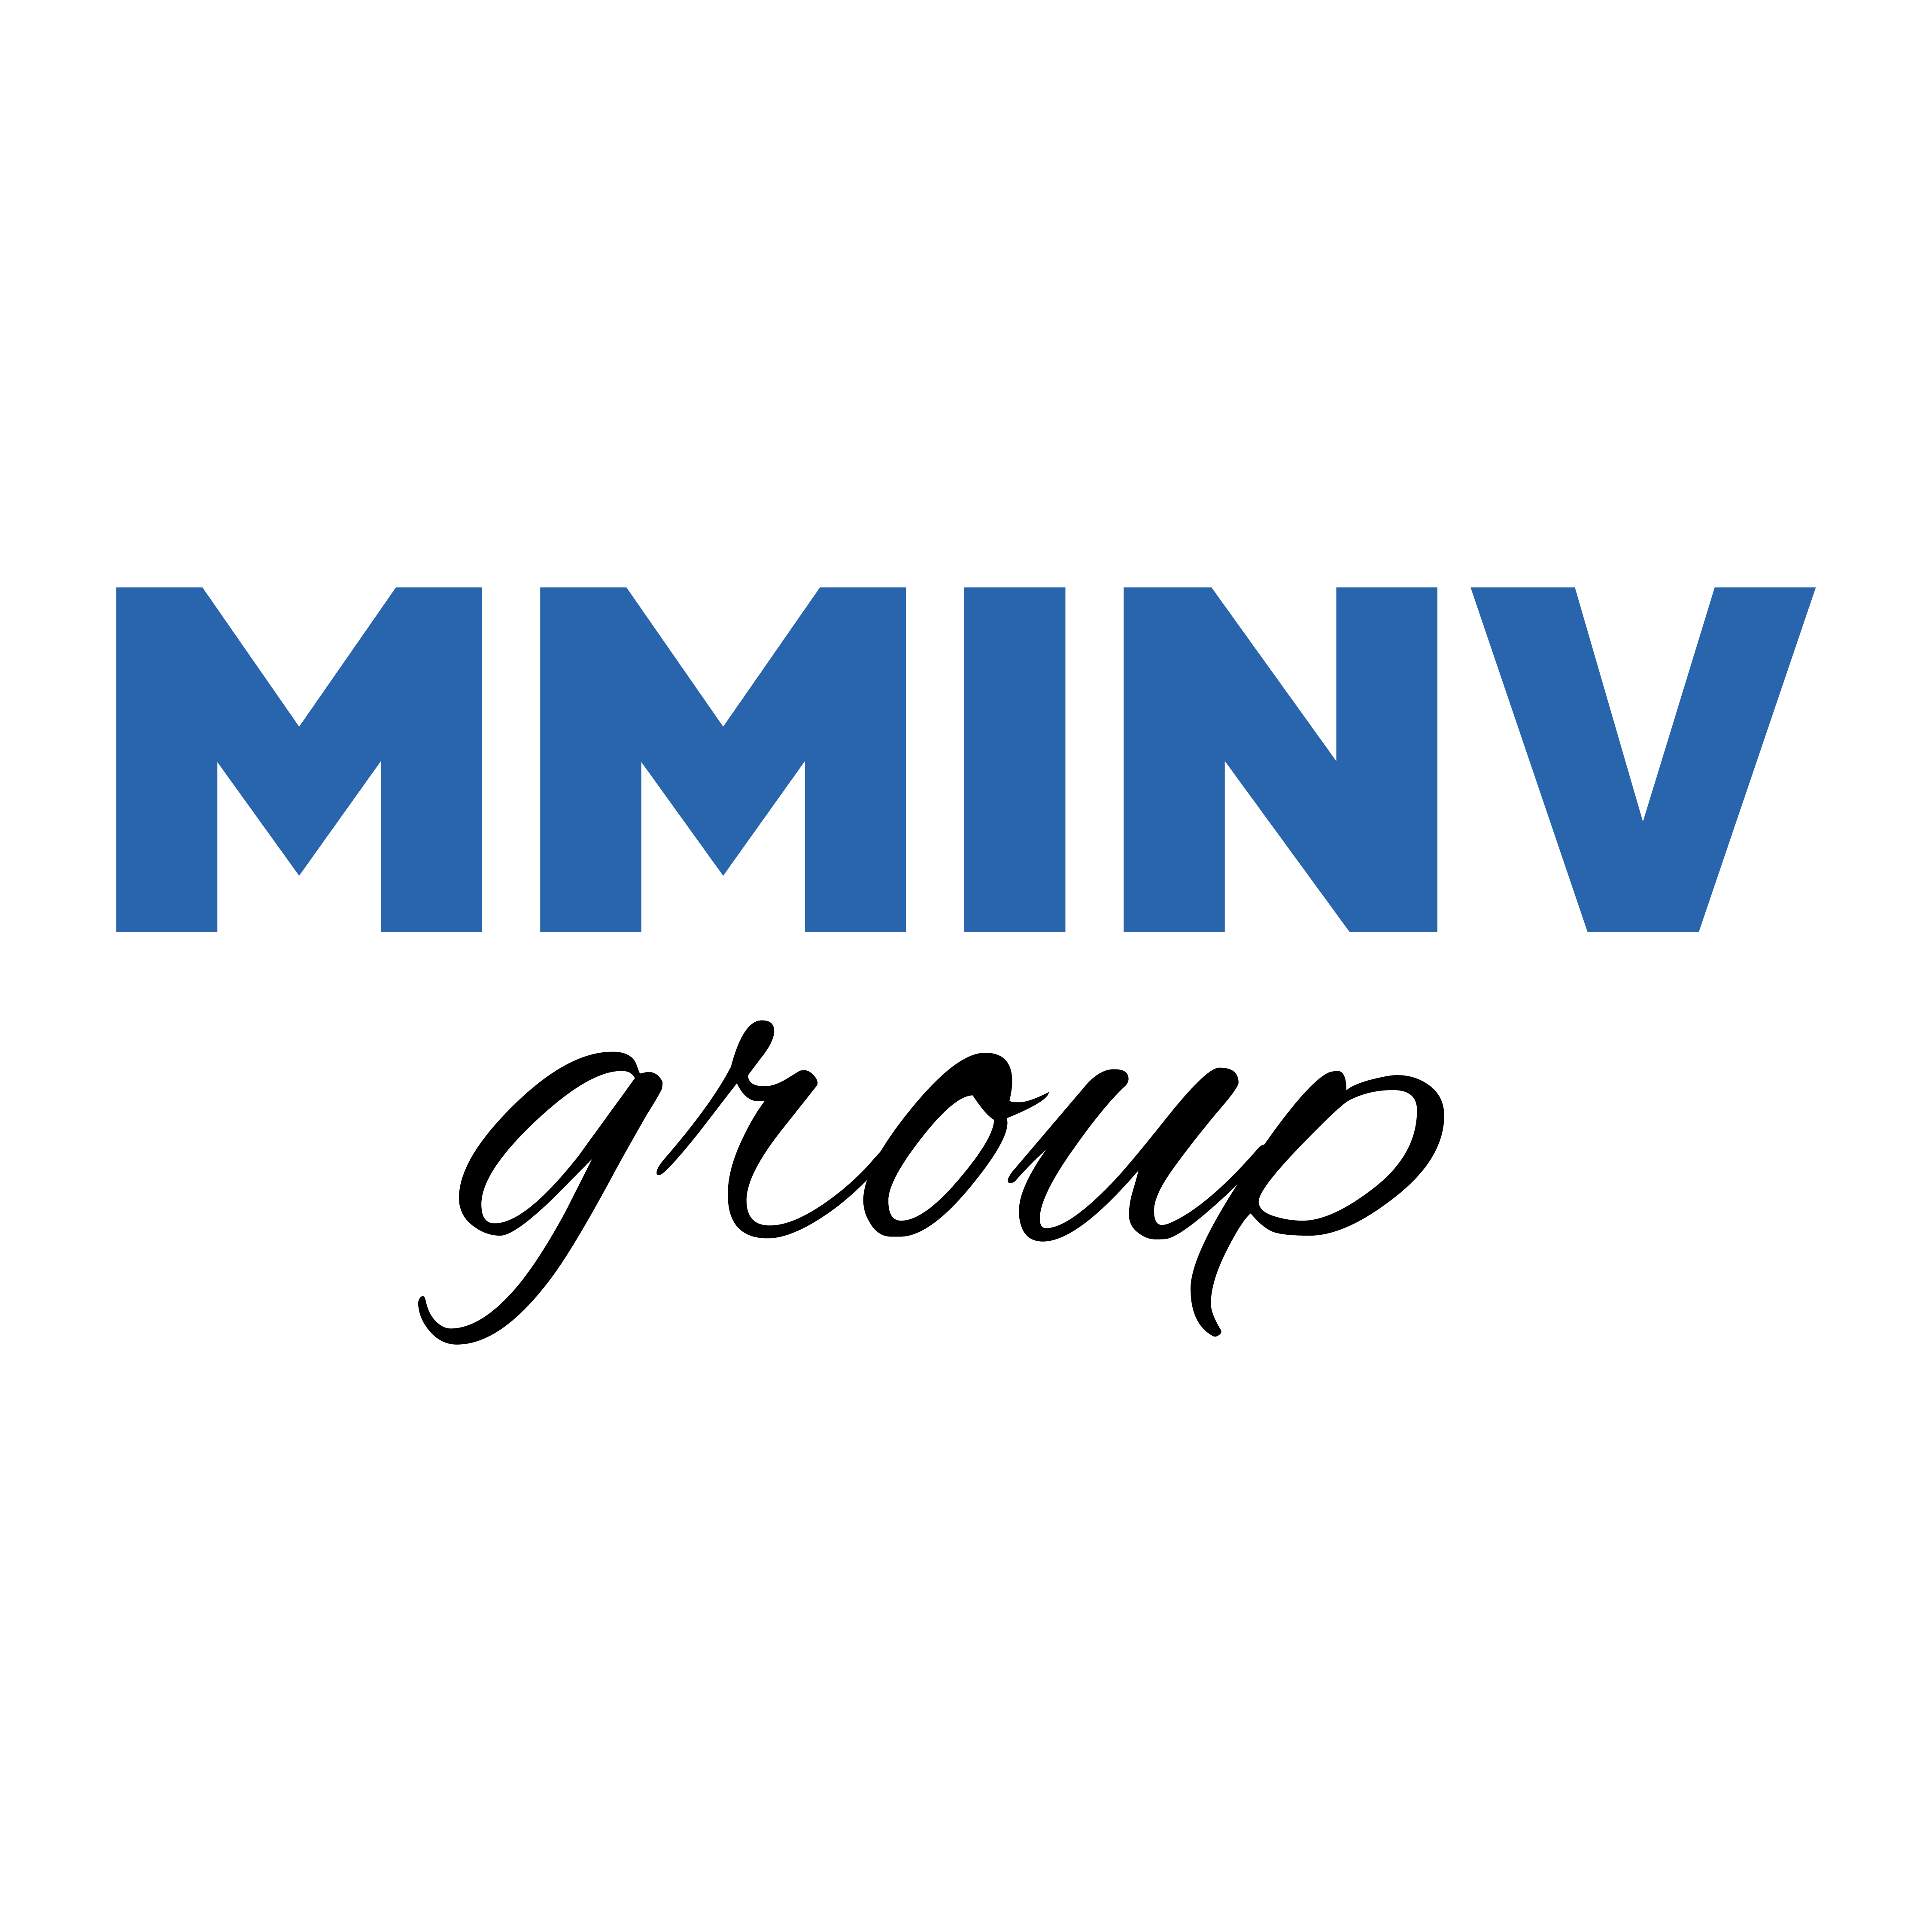 MMINV s.r.o.